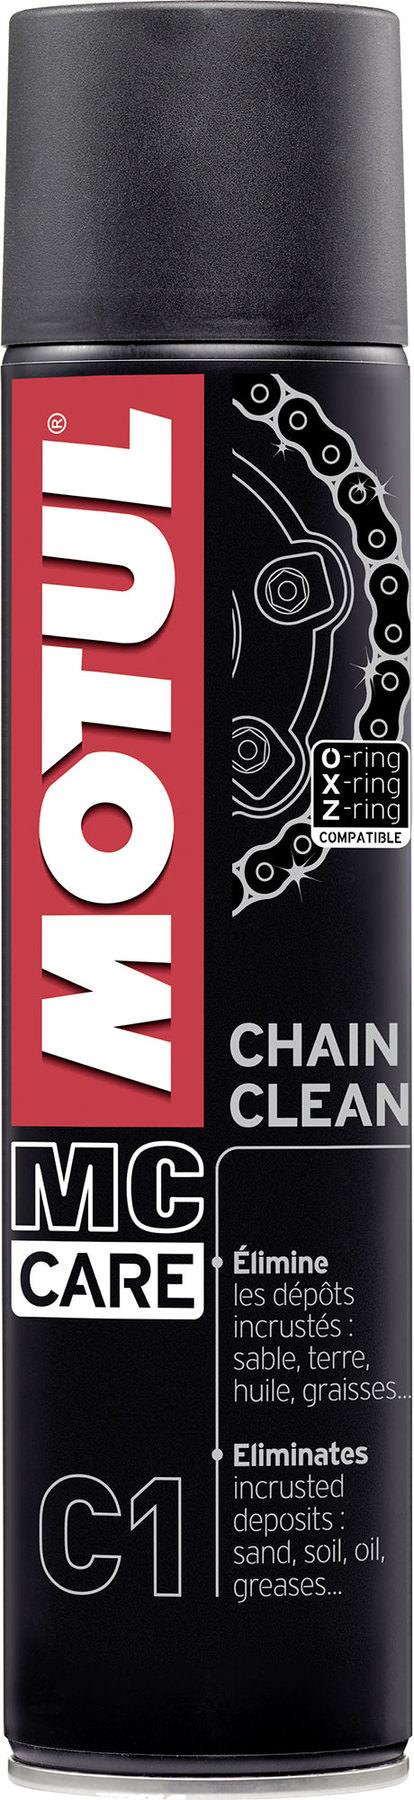 Купить Очиститель цепи Motul C1 CHAIN CLEAN